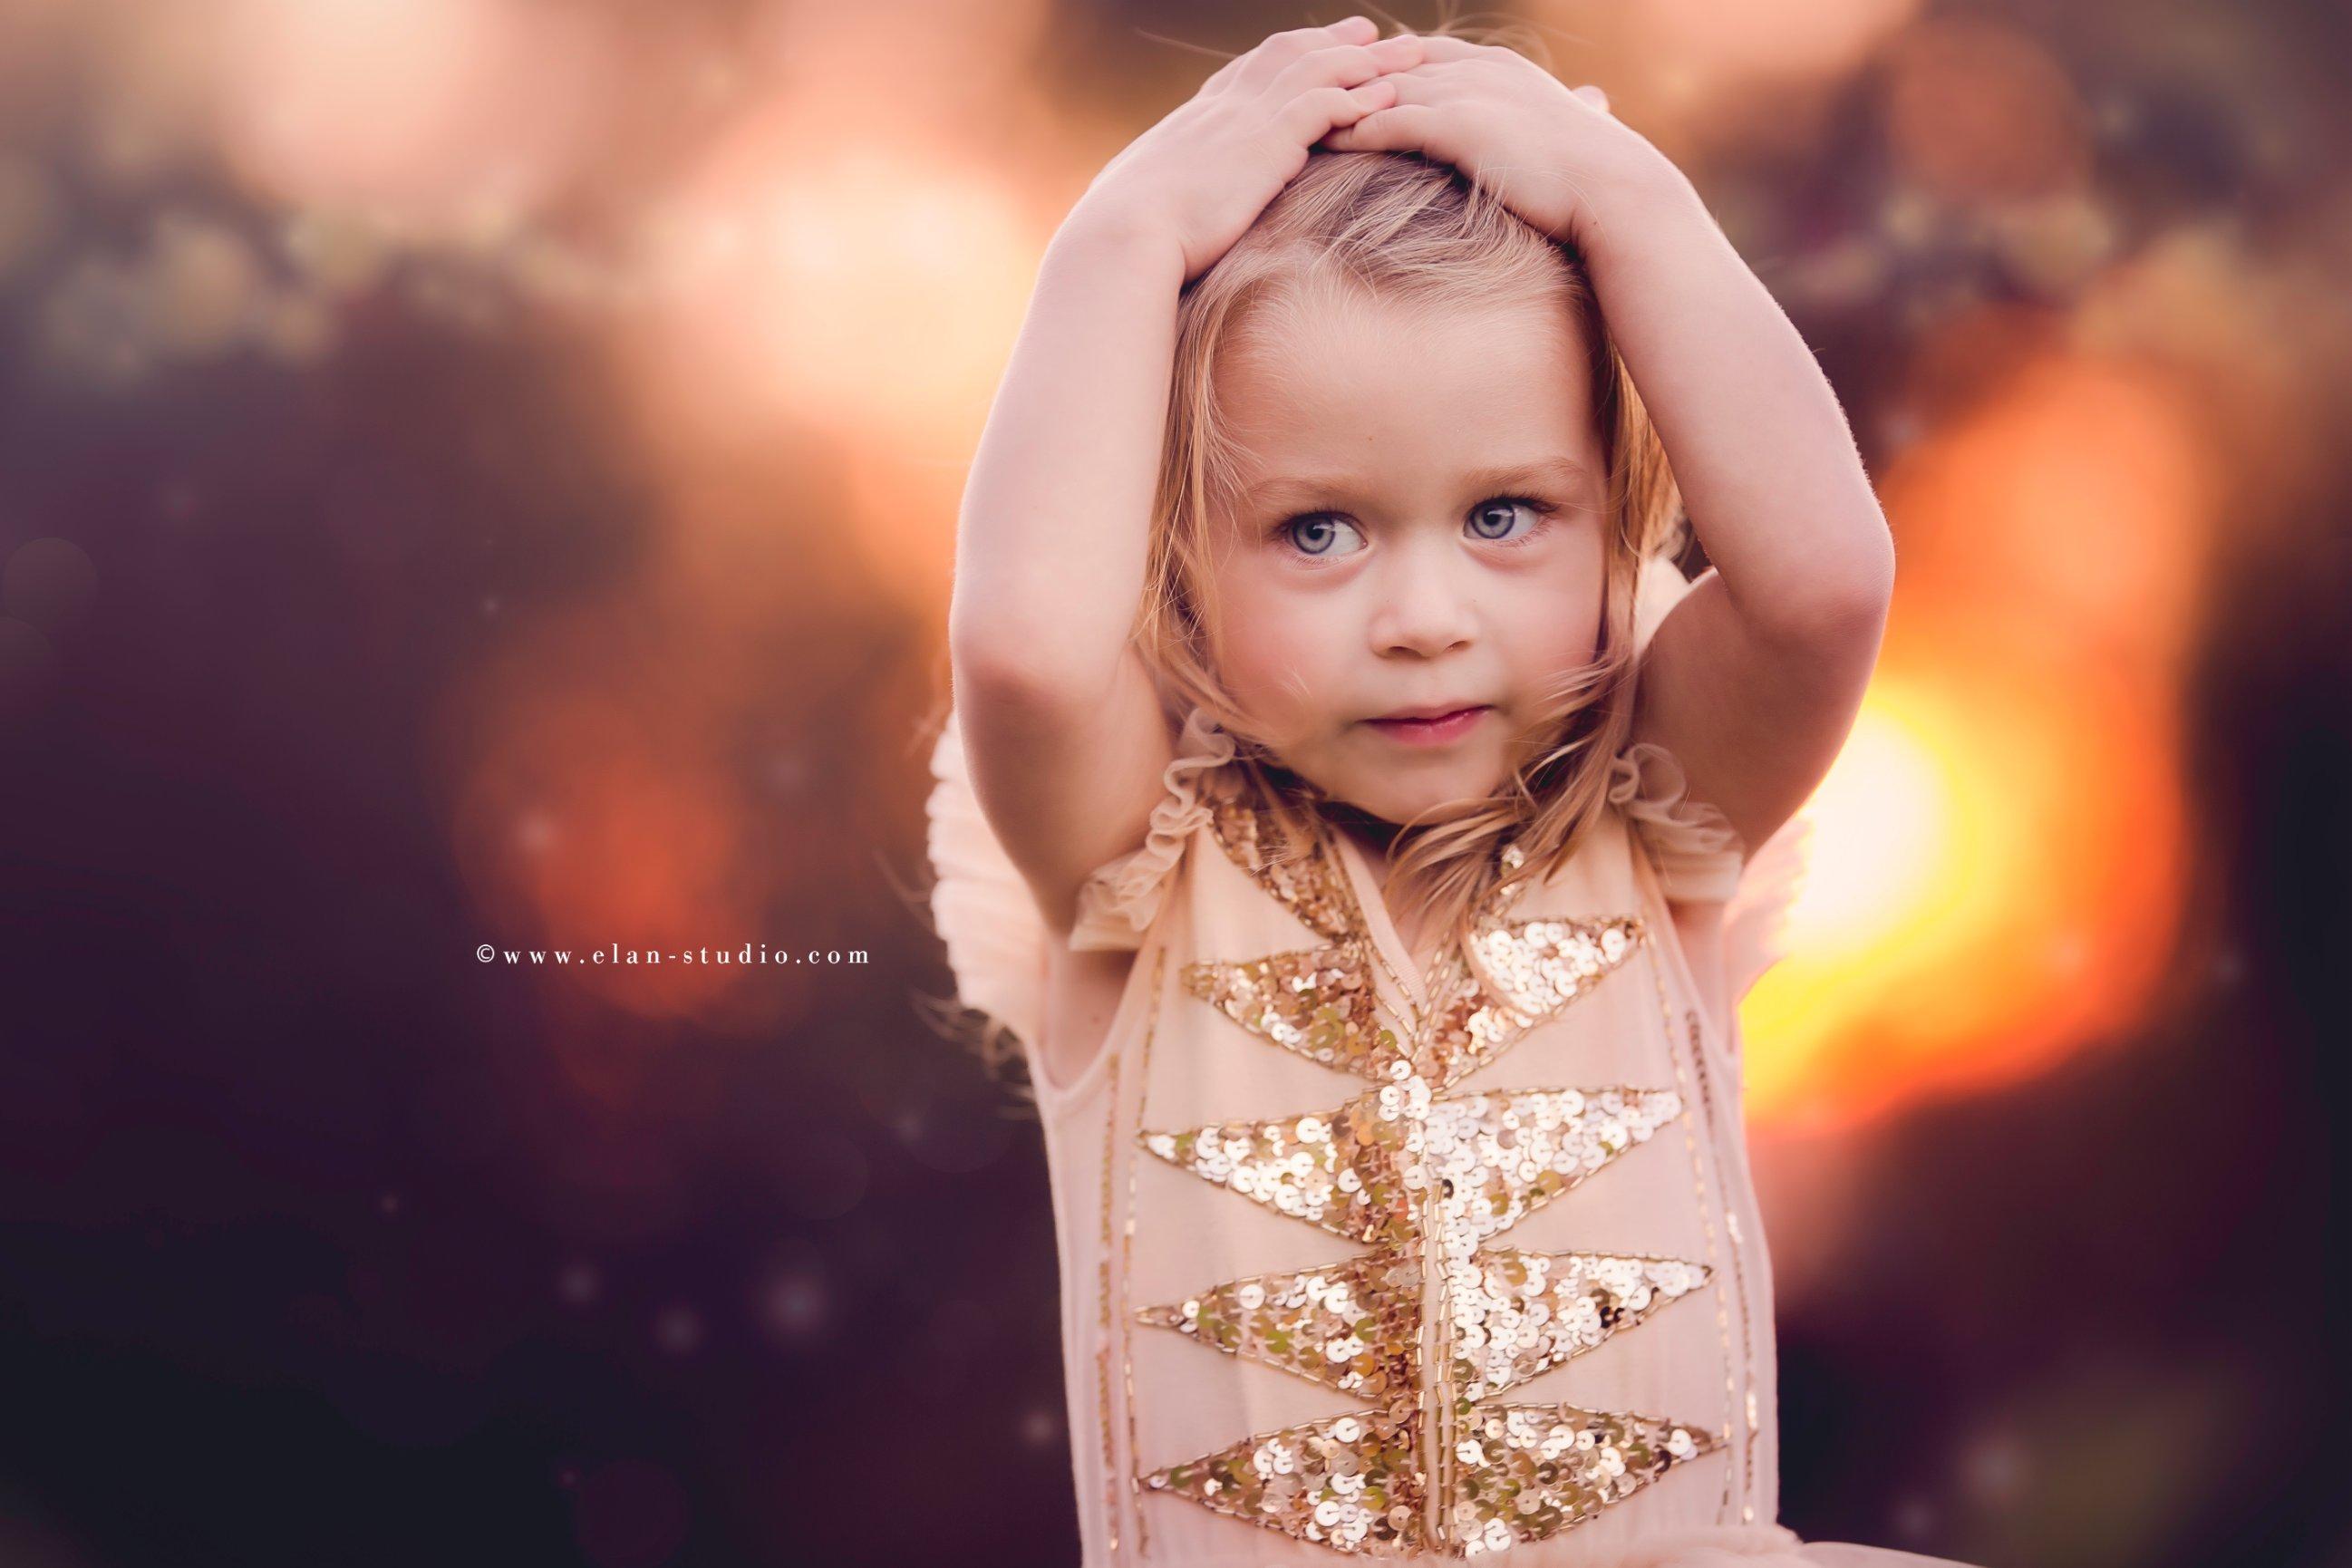 blonde little girl, golden hour photography, bokeh, golden hour bokeh, Elan Studio